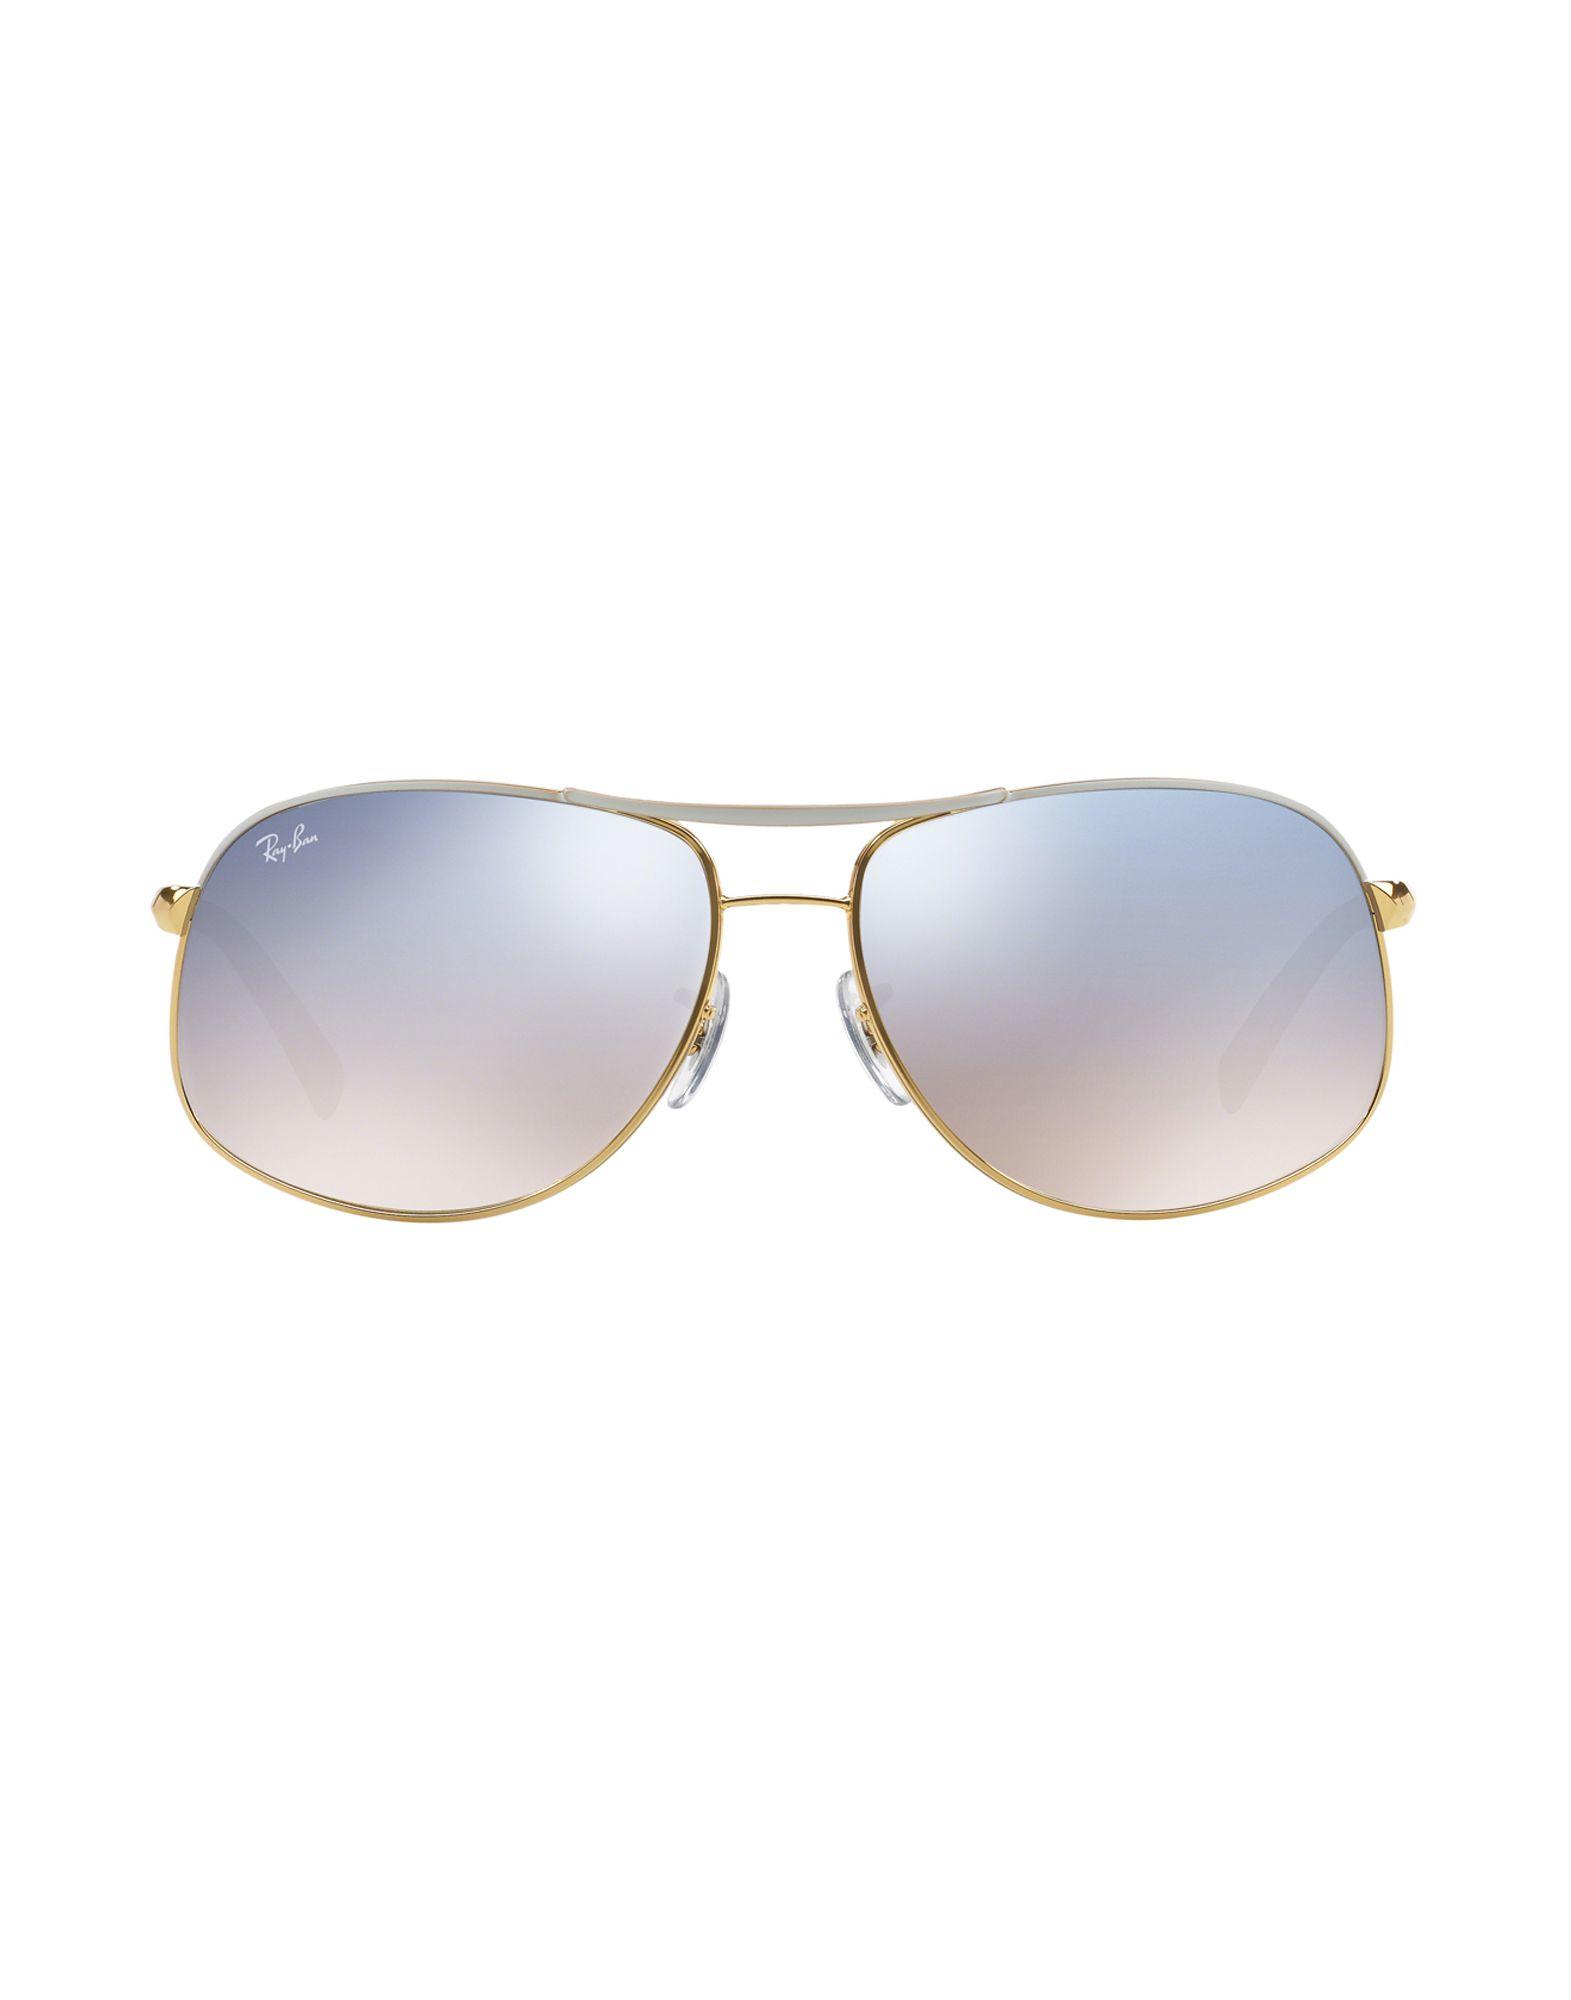 04cb3b73031 Ray Ban Sunglasses White Gold Man « Heritage Malta